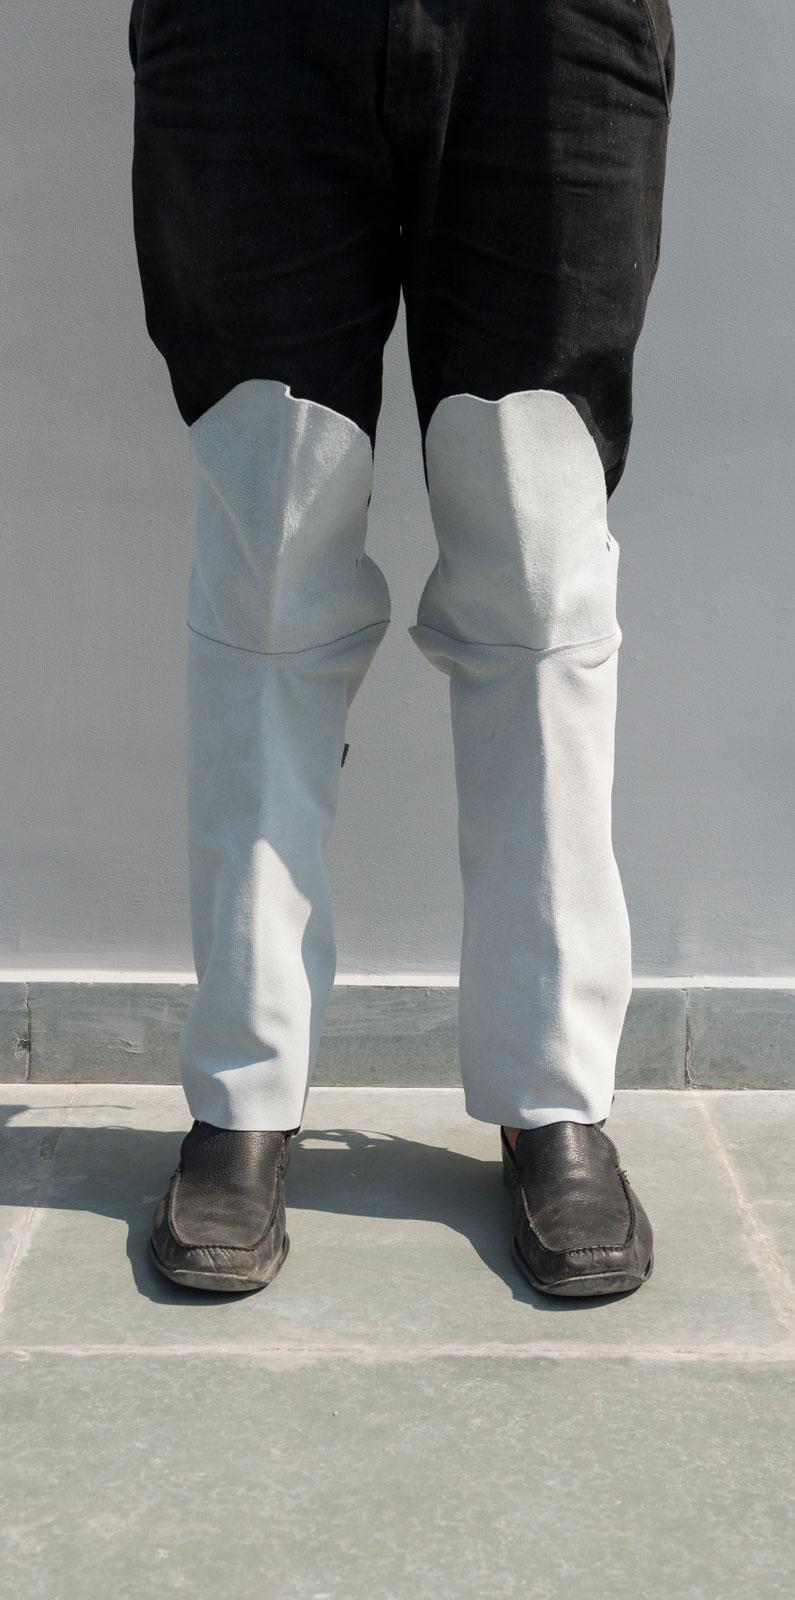 leg-guard.jpg